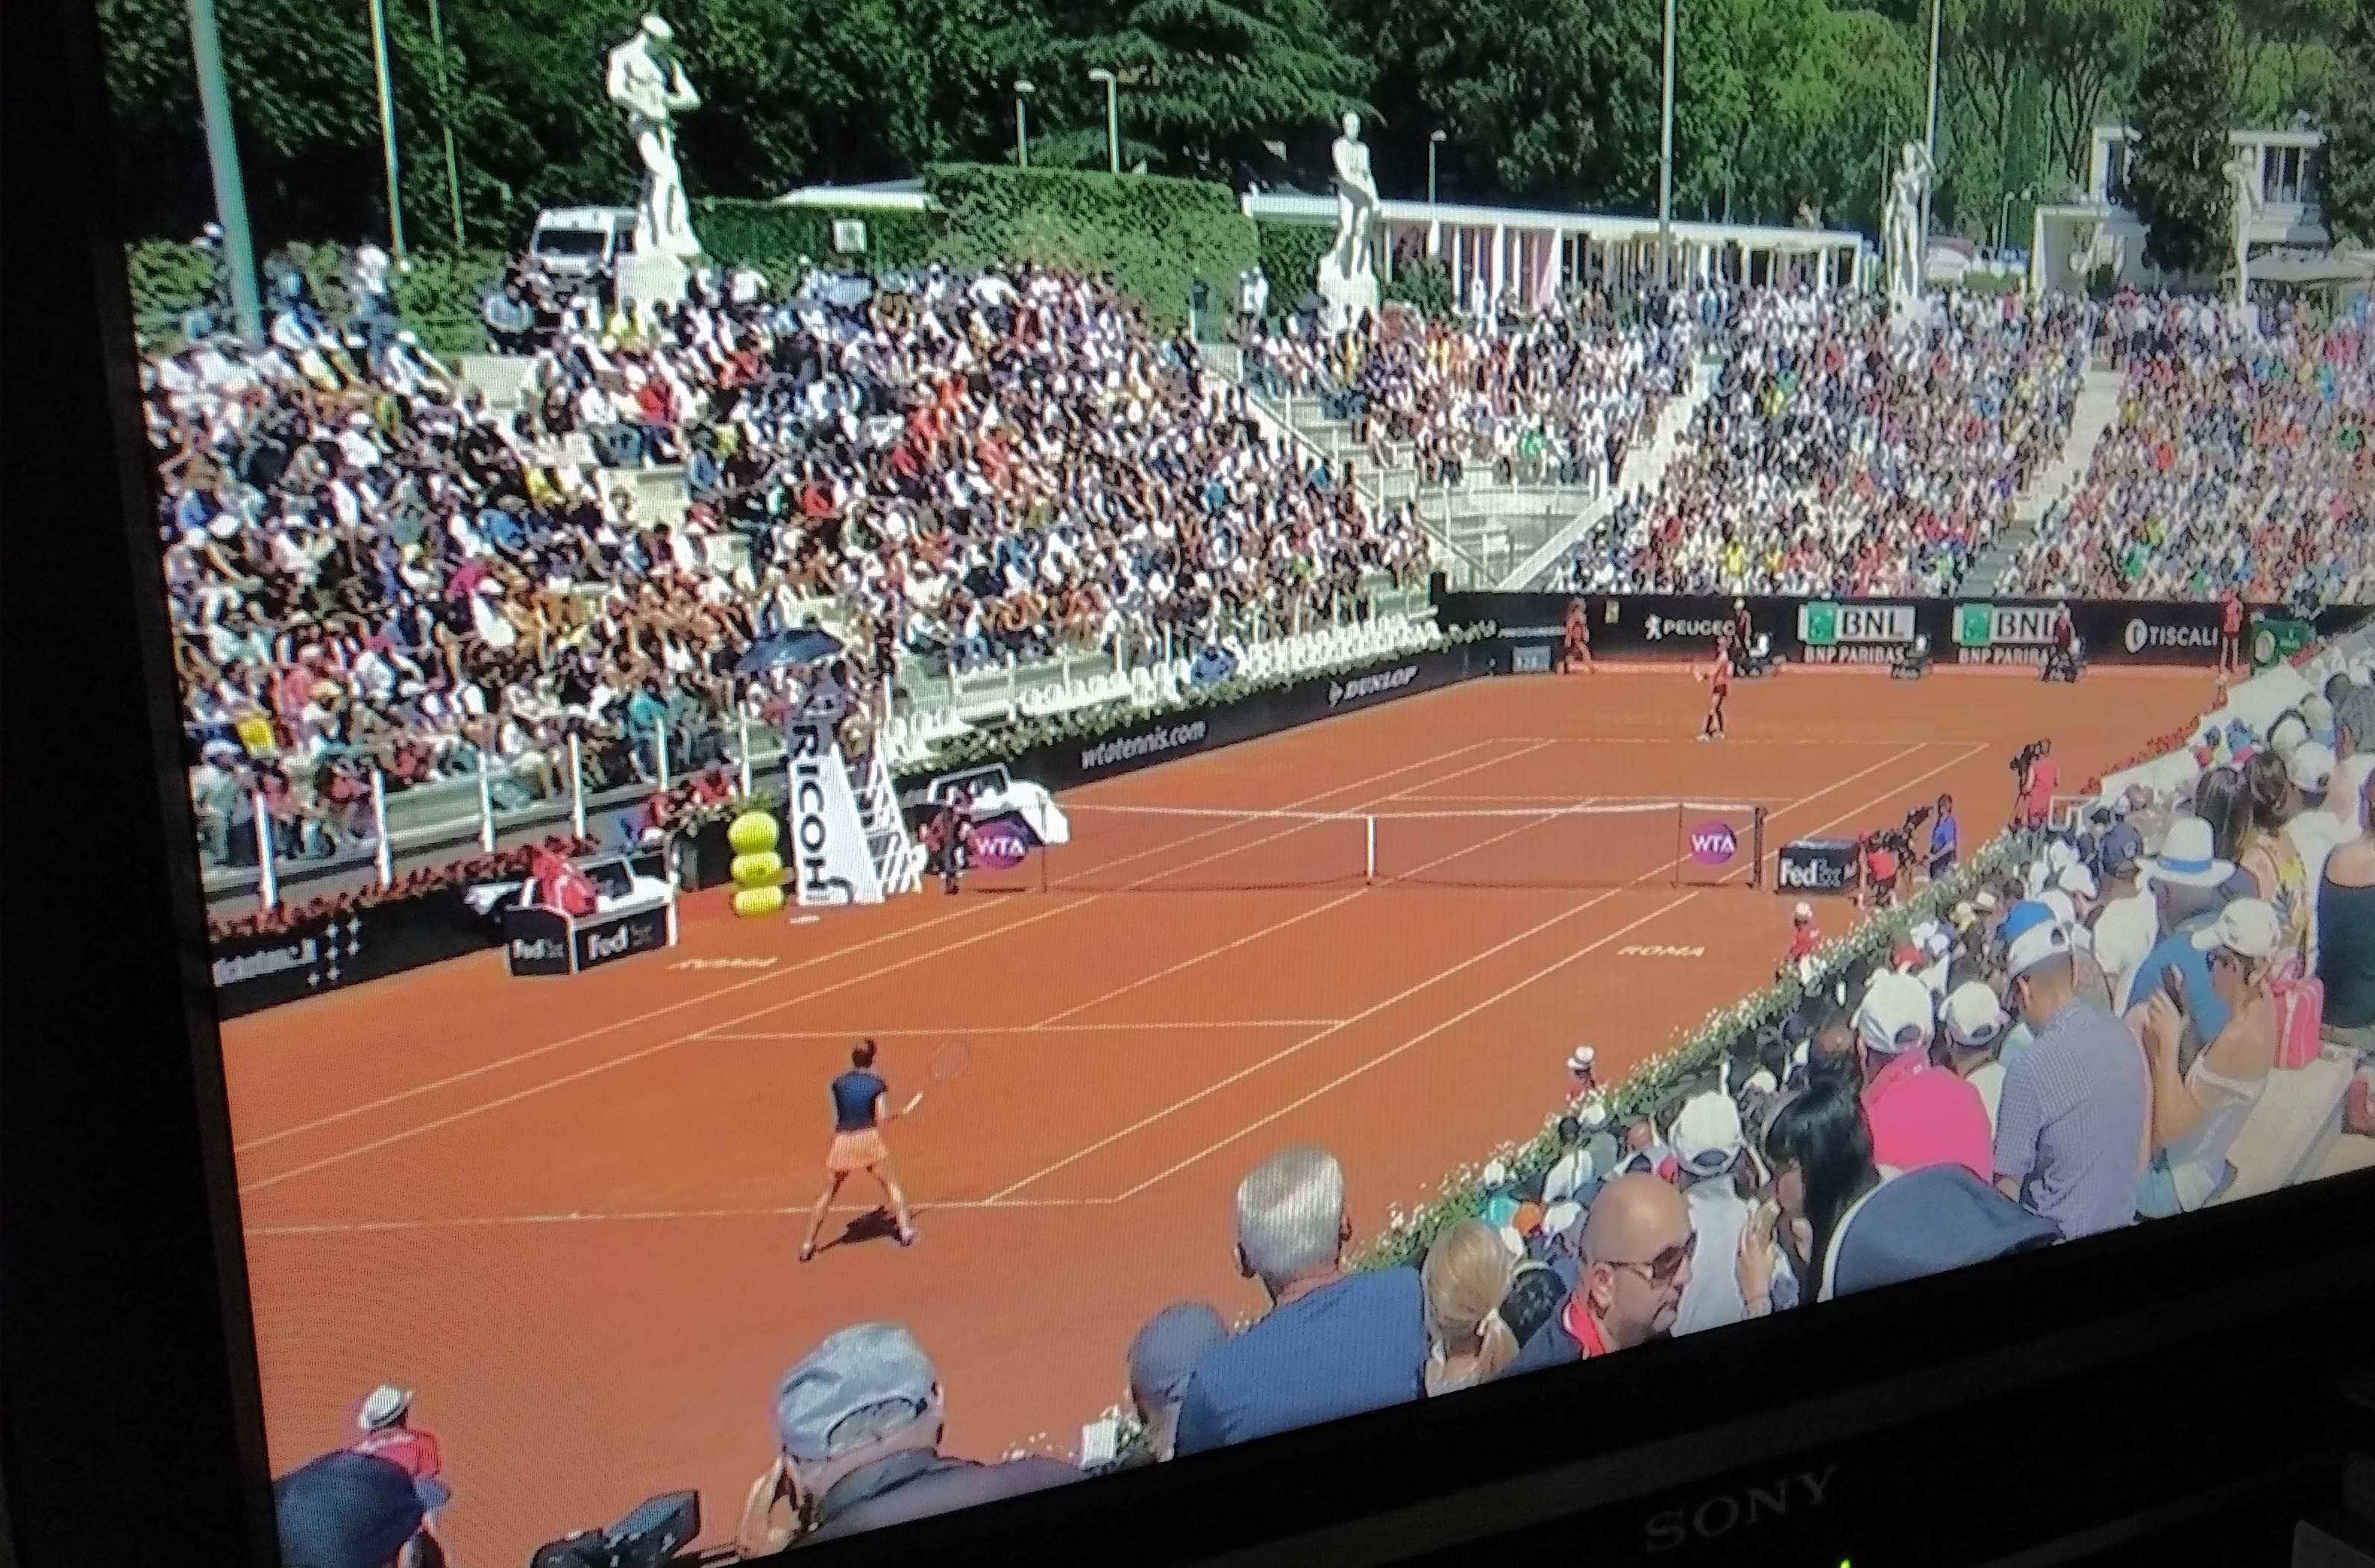 Watching tennis on TV